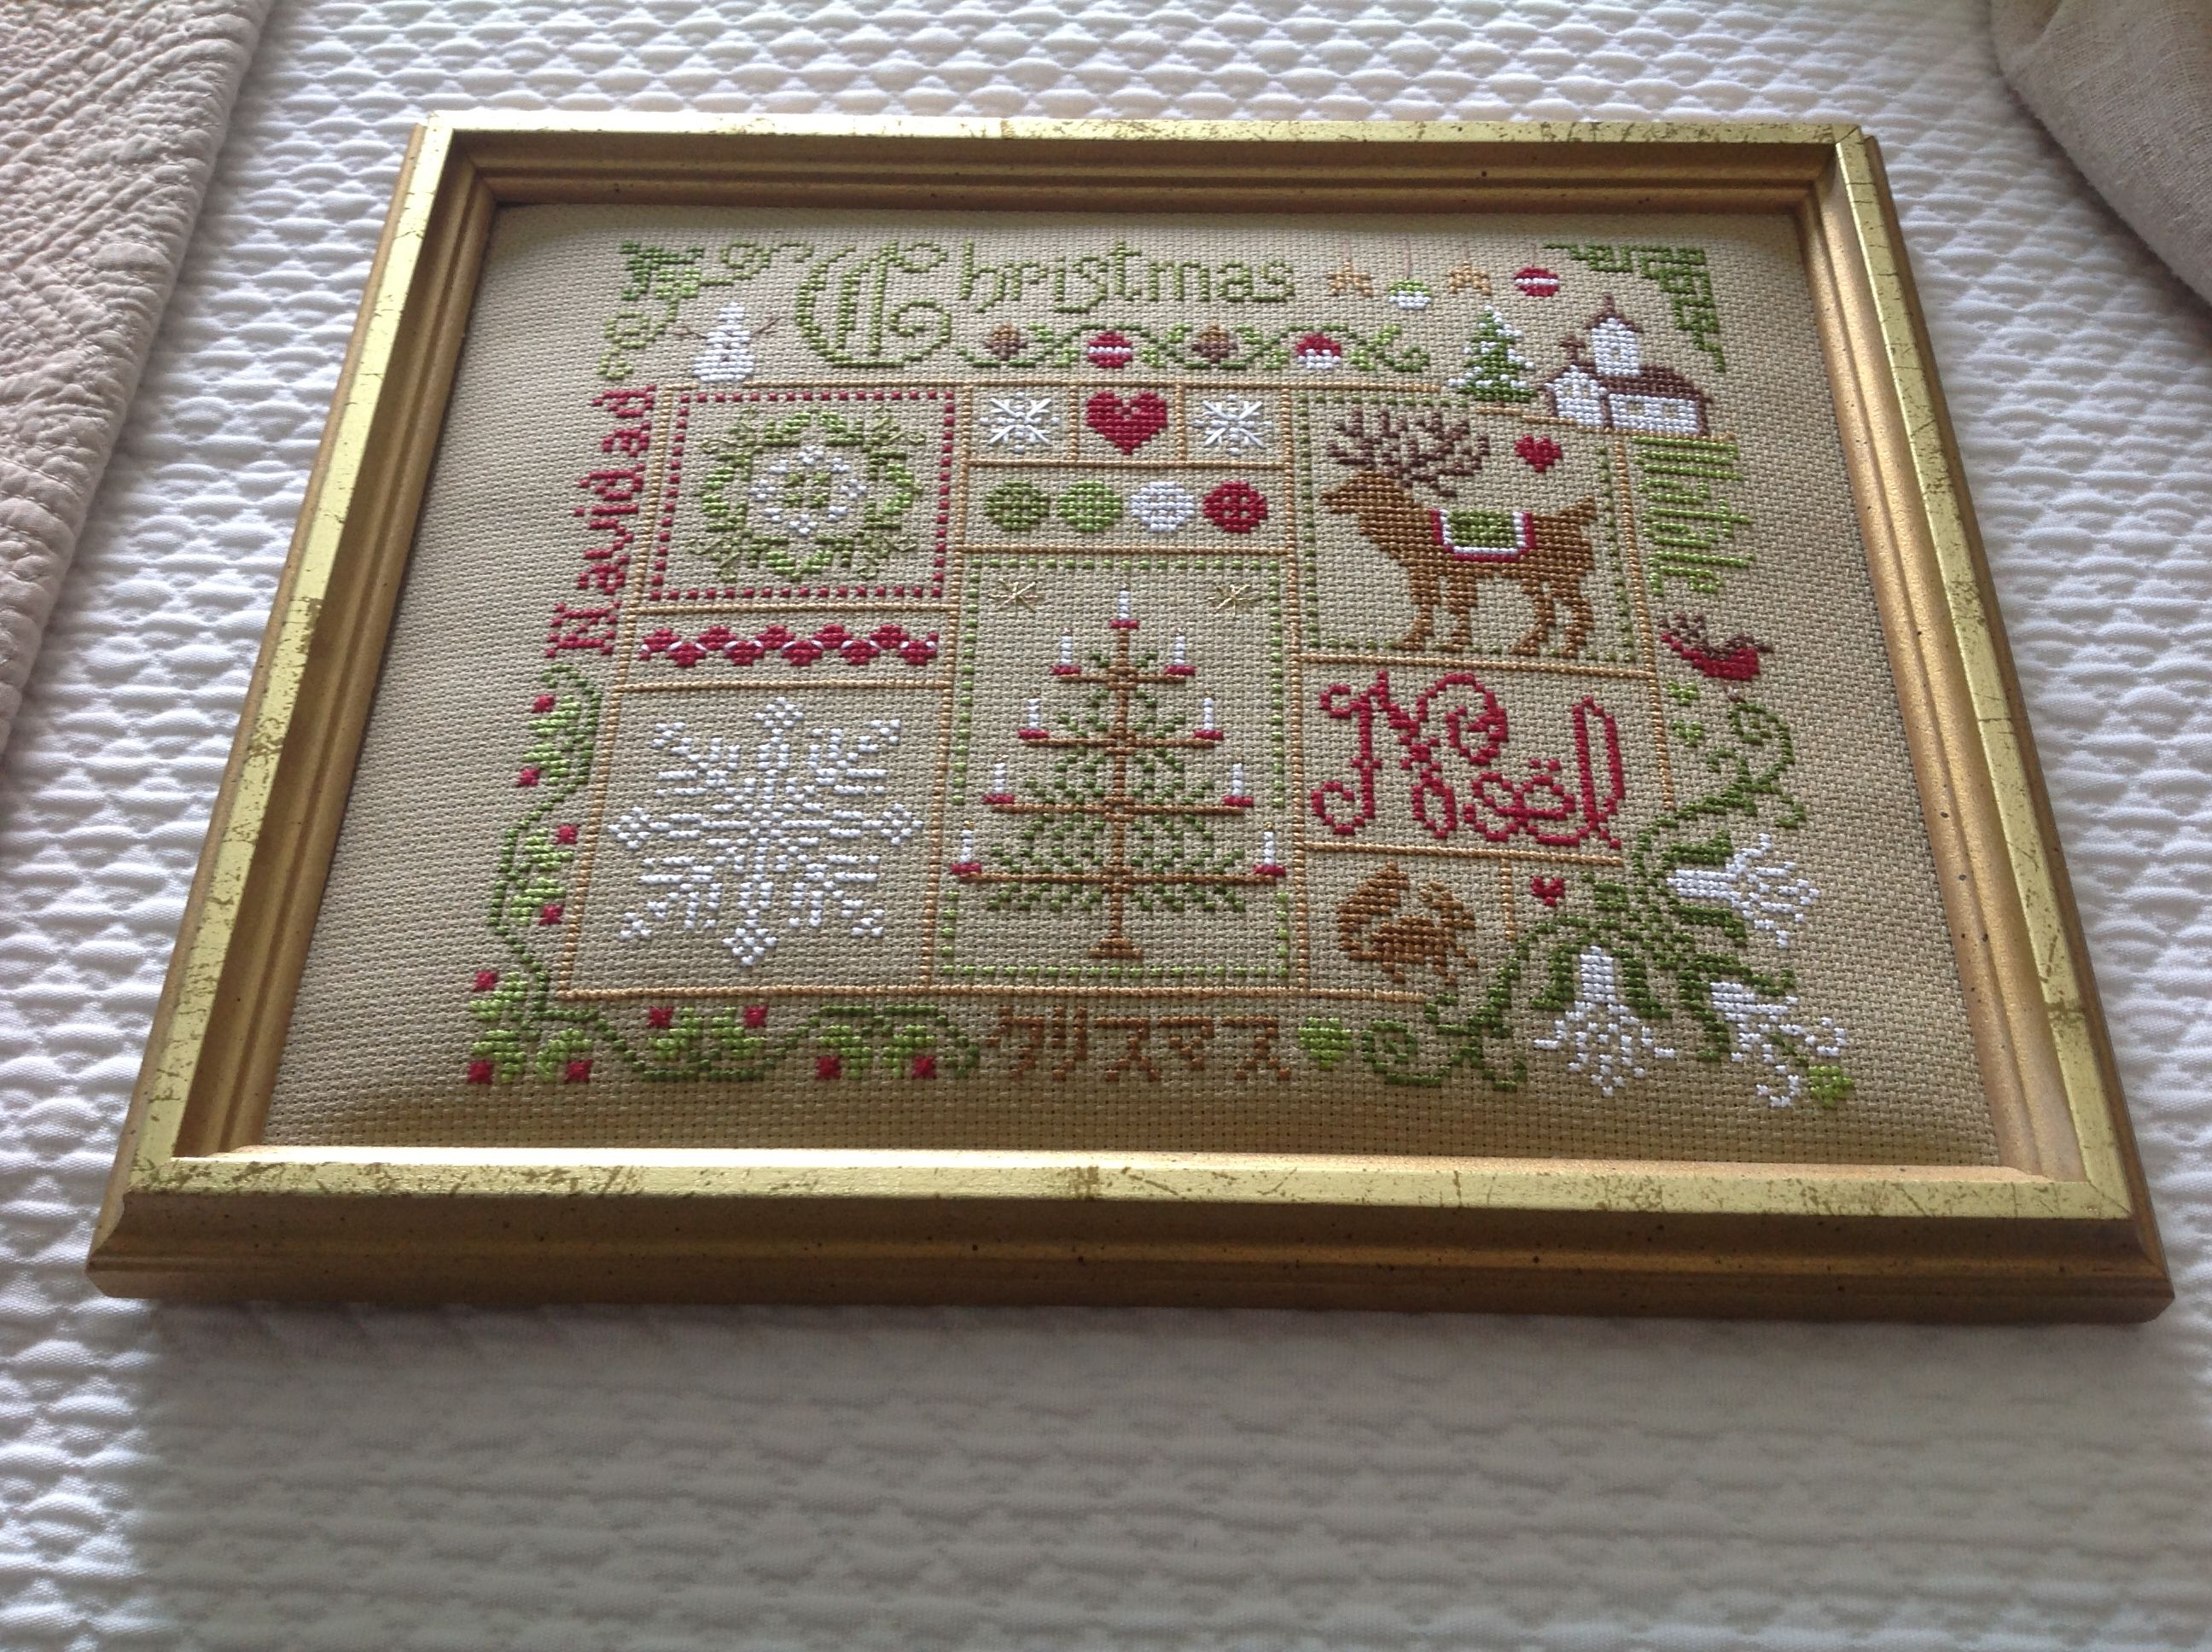 Noreen d jardin prive cross stitch winter pinterest for Jardin prive